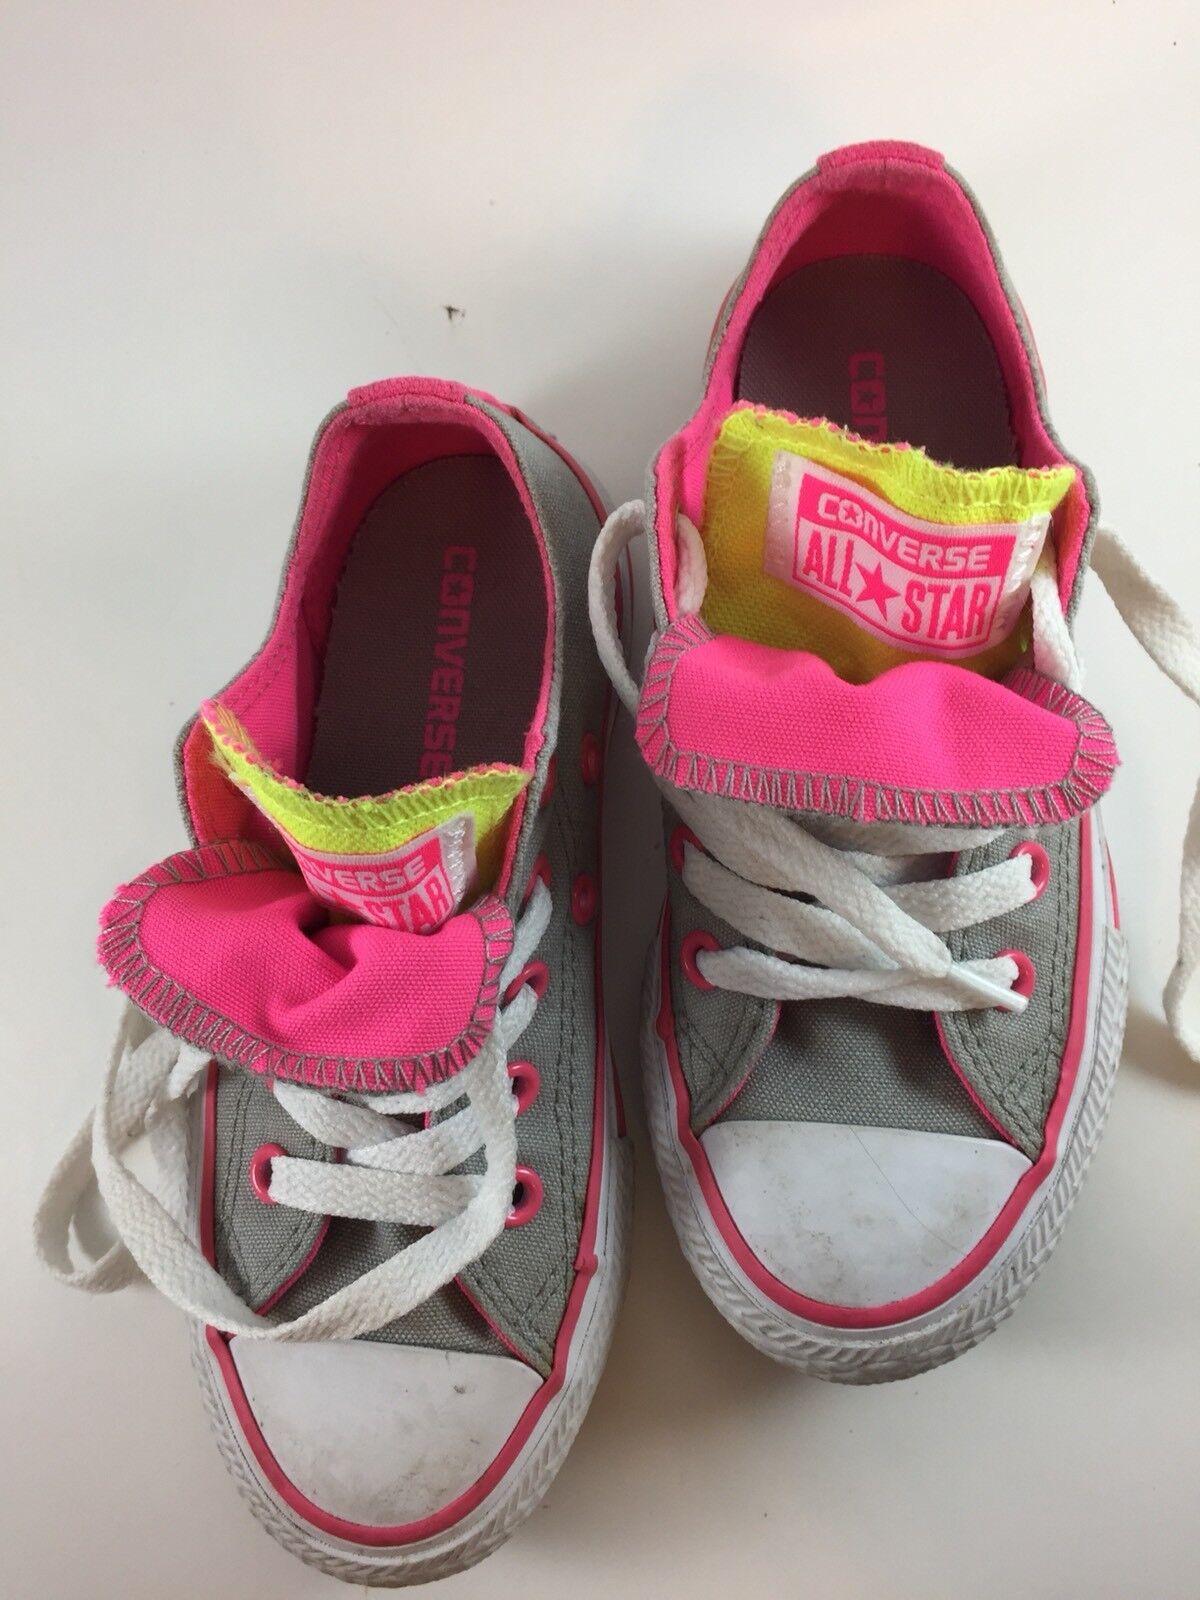 Converse 11 All Star Kids Size 11 Converse Girls Pink Gray ffed16